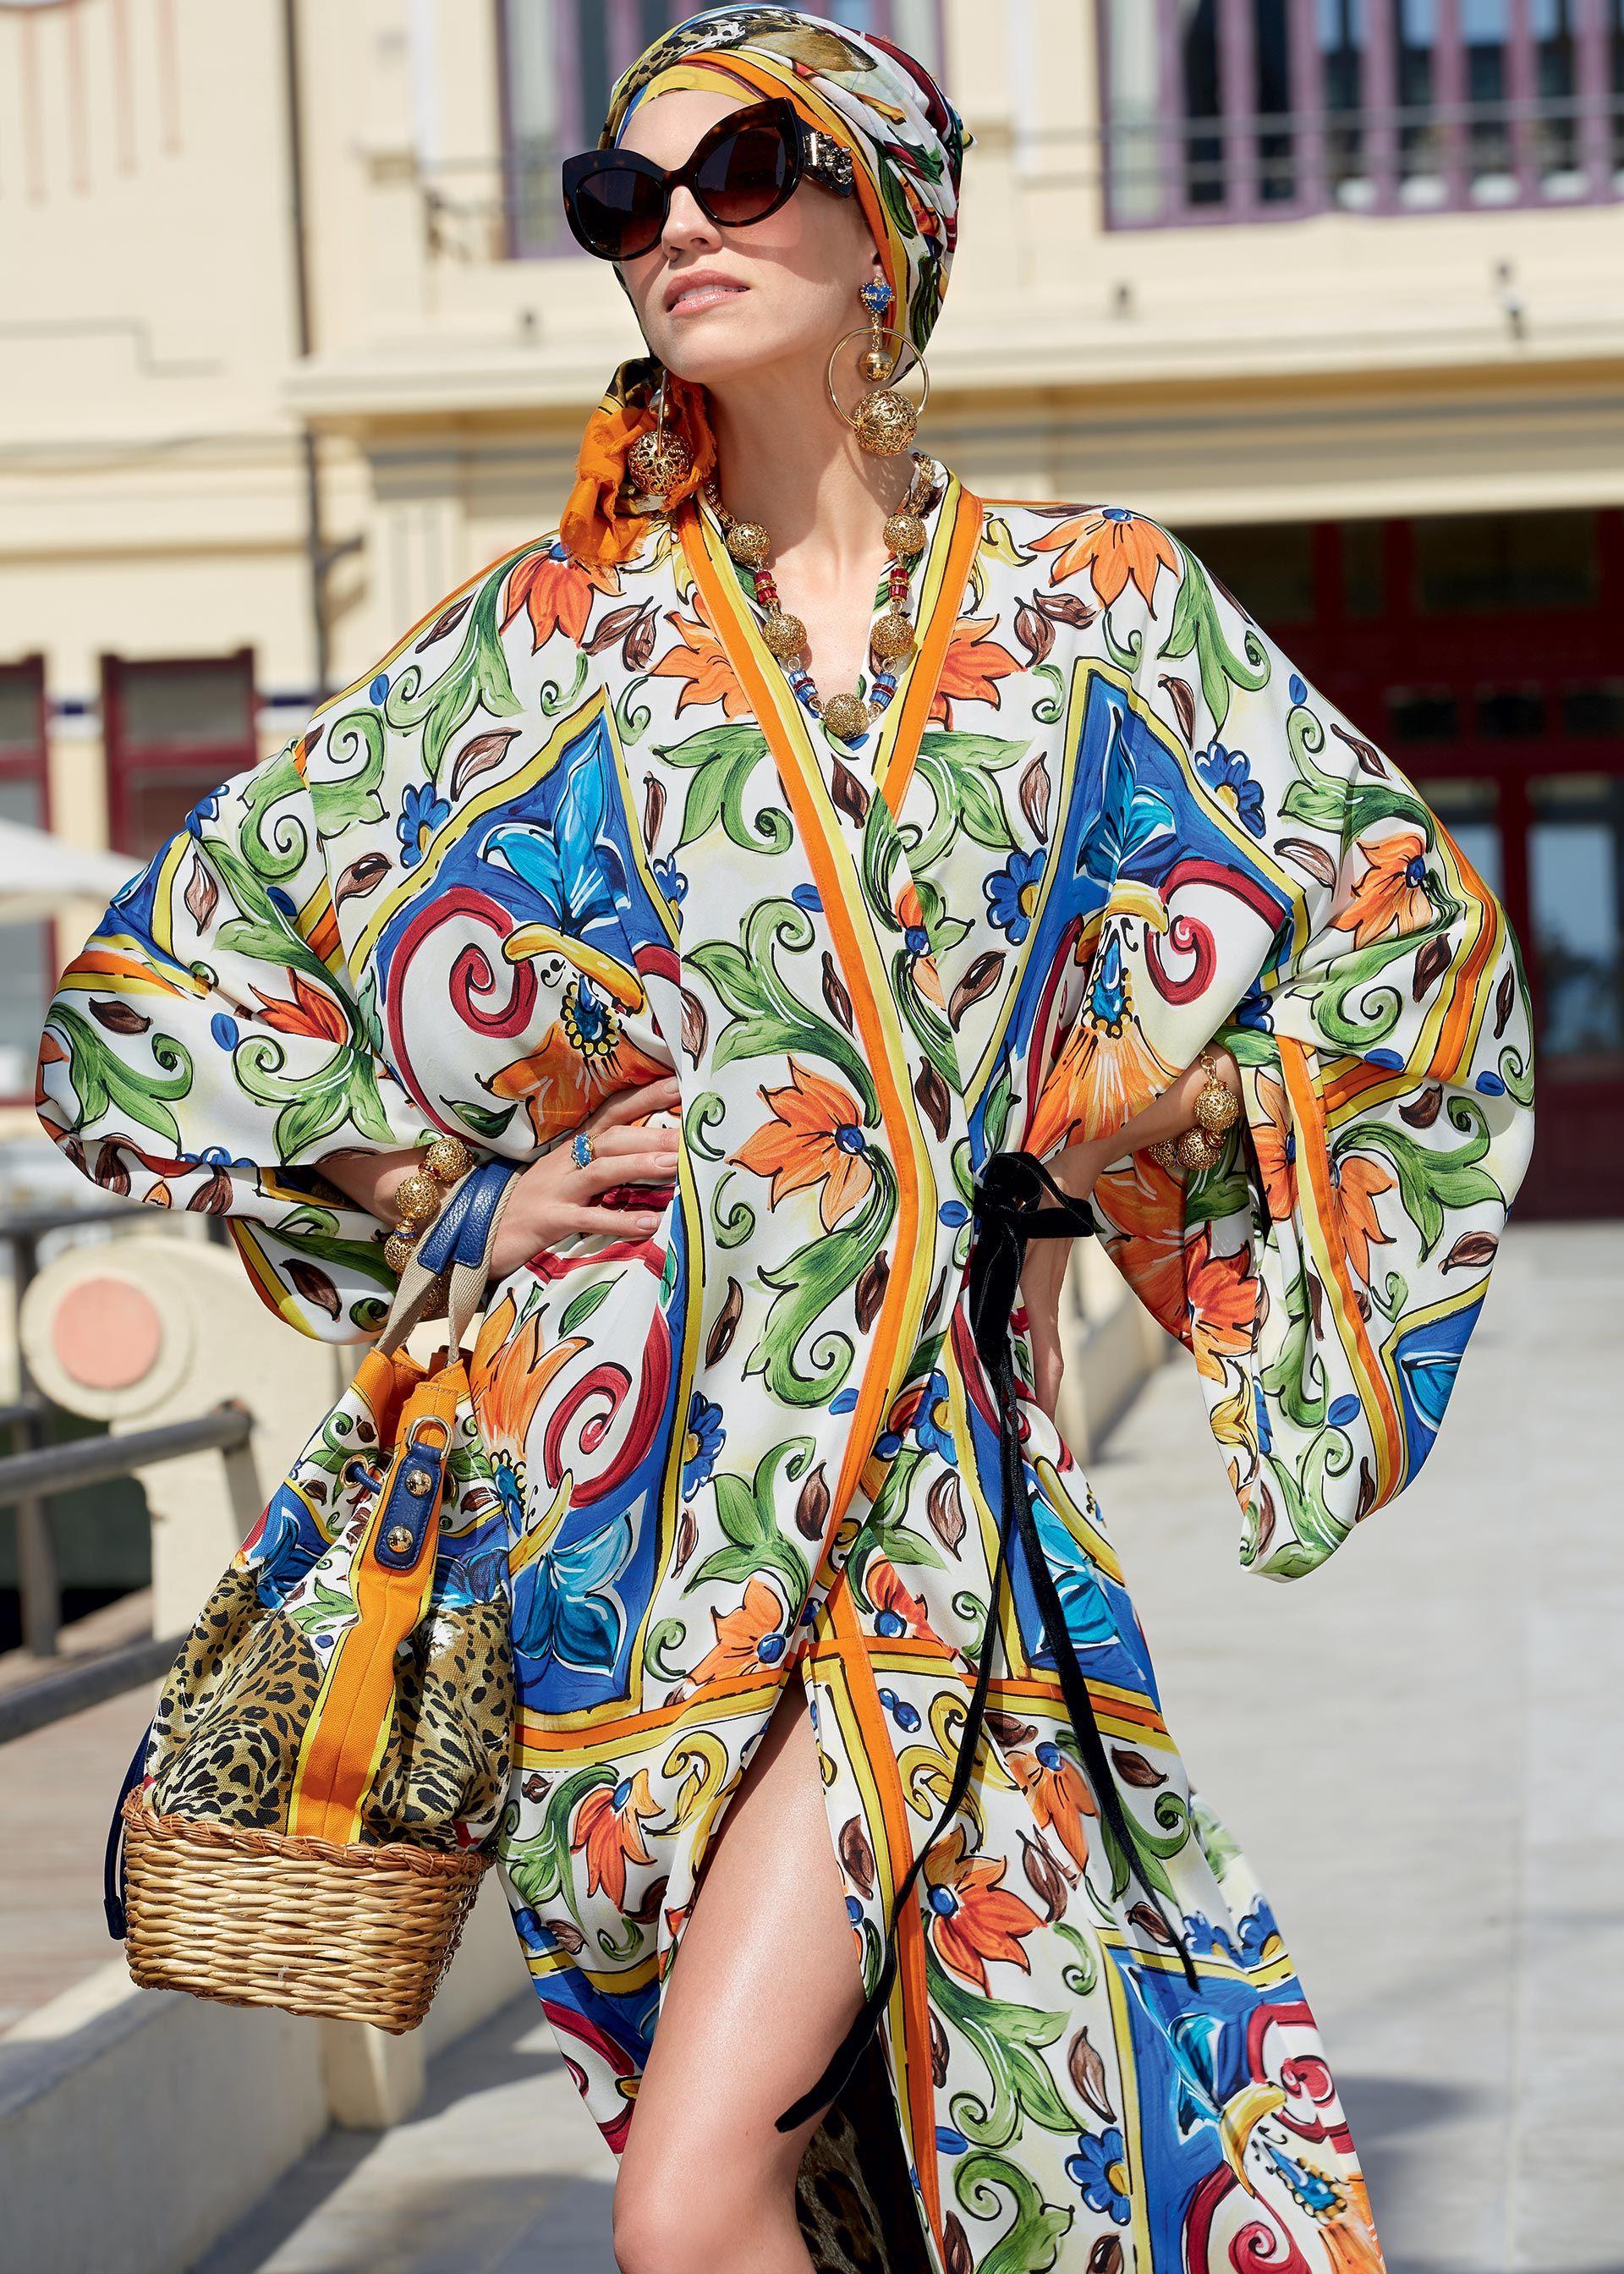 Leopard Printed Slip Ons Spring/summerDolce & Gabbana LoanGiR1T6